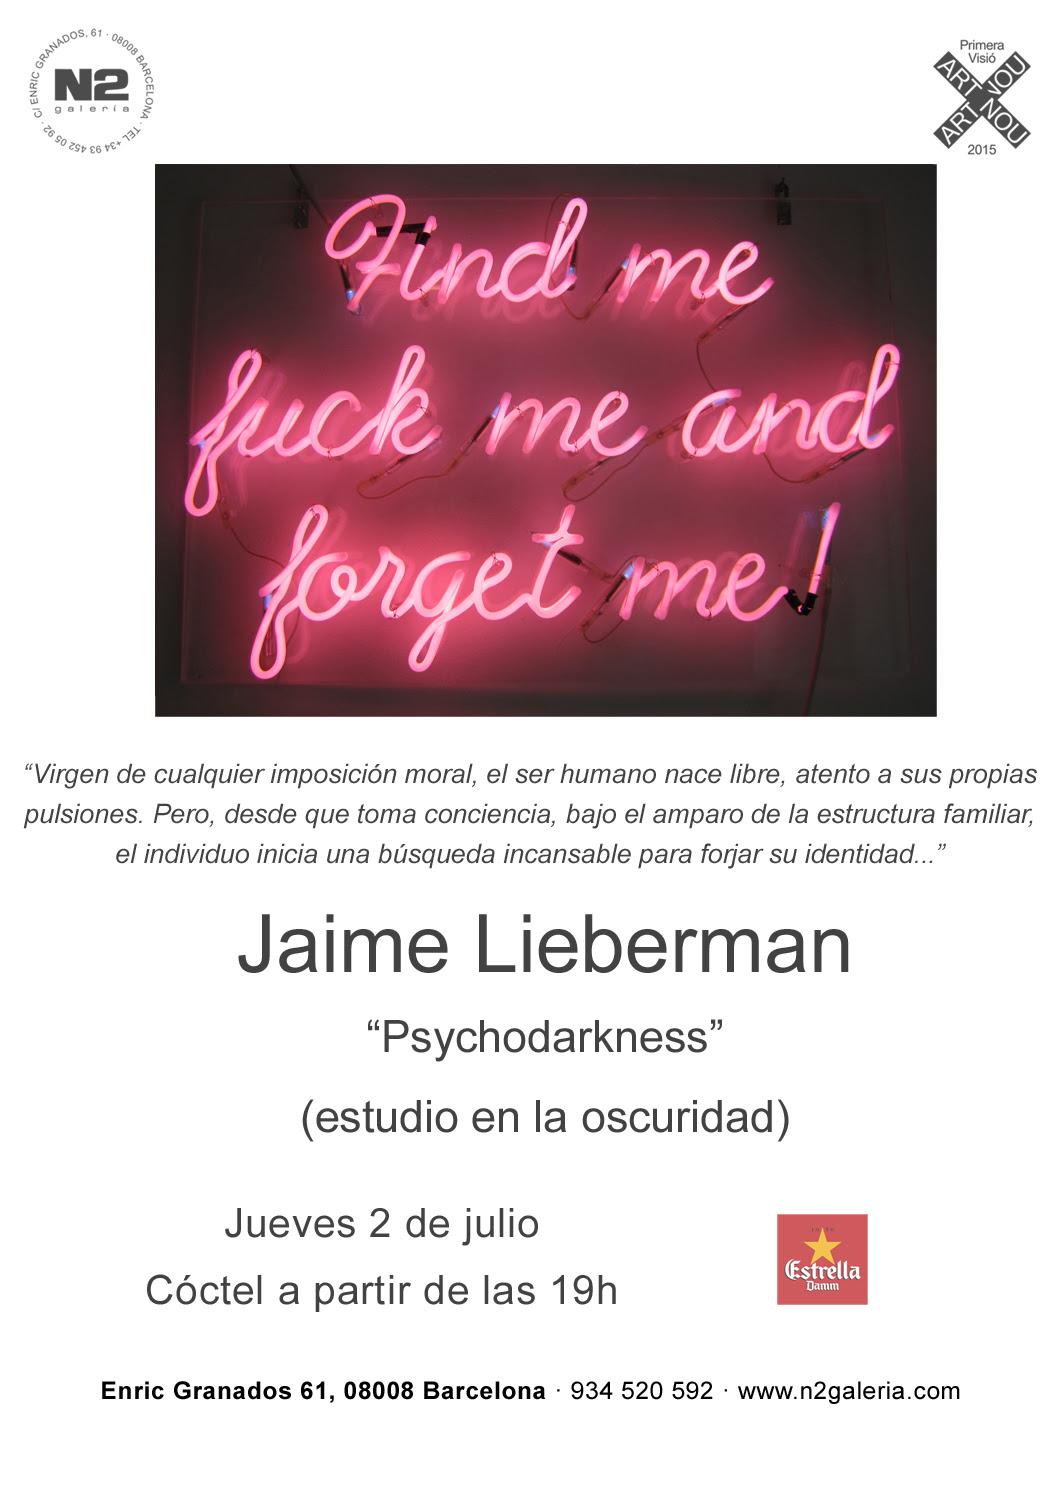 Jaime Lieberman Art Nou